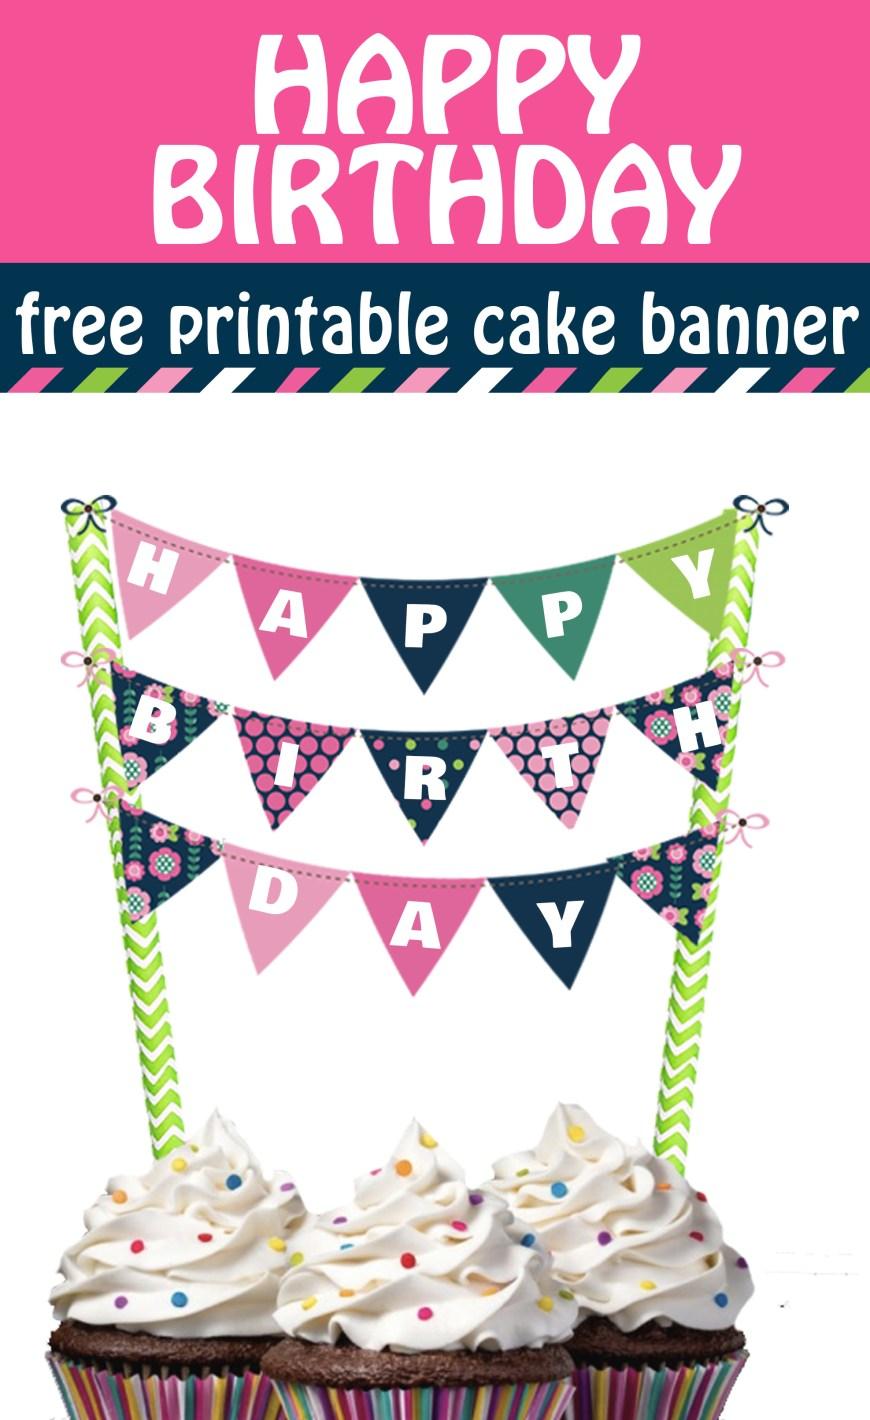 Happy Birthday Cake Banner Cheerful And Bright Happy Birthday Cake Banner Free Printable